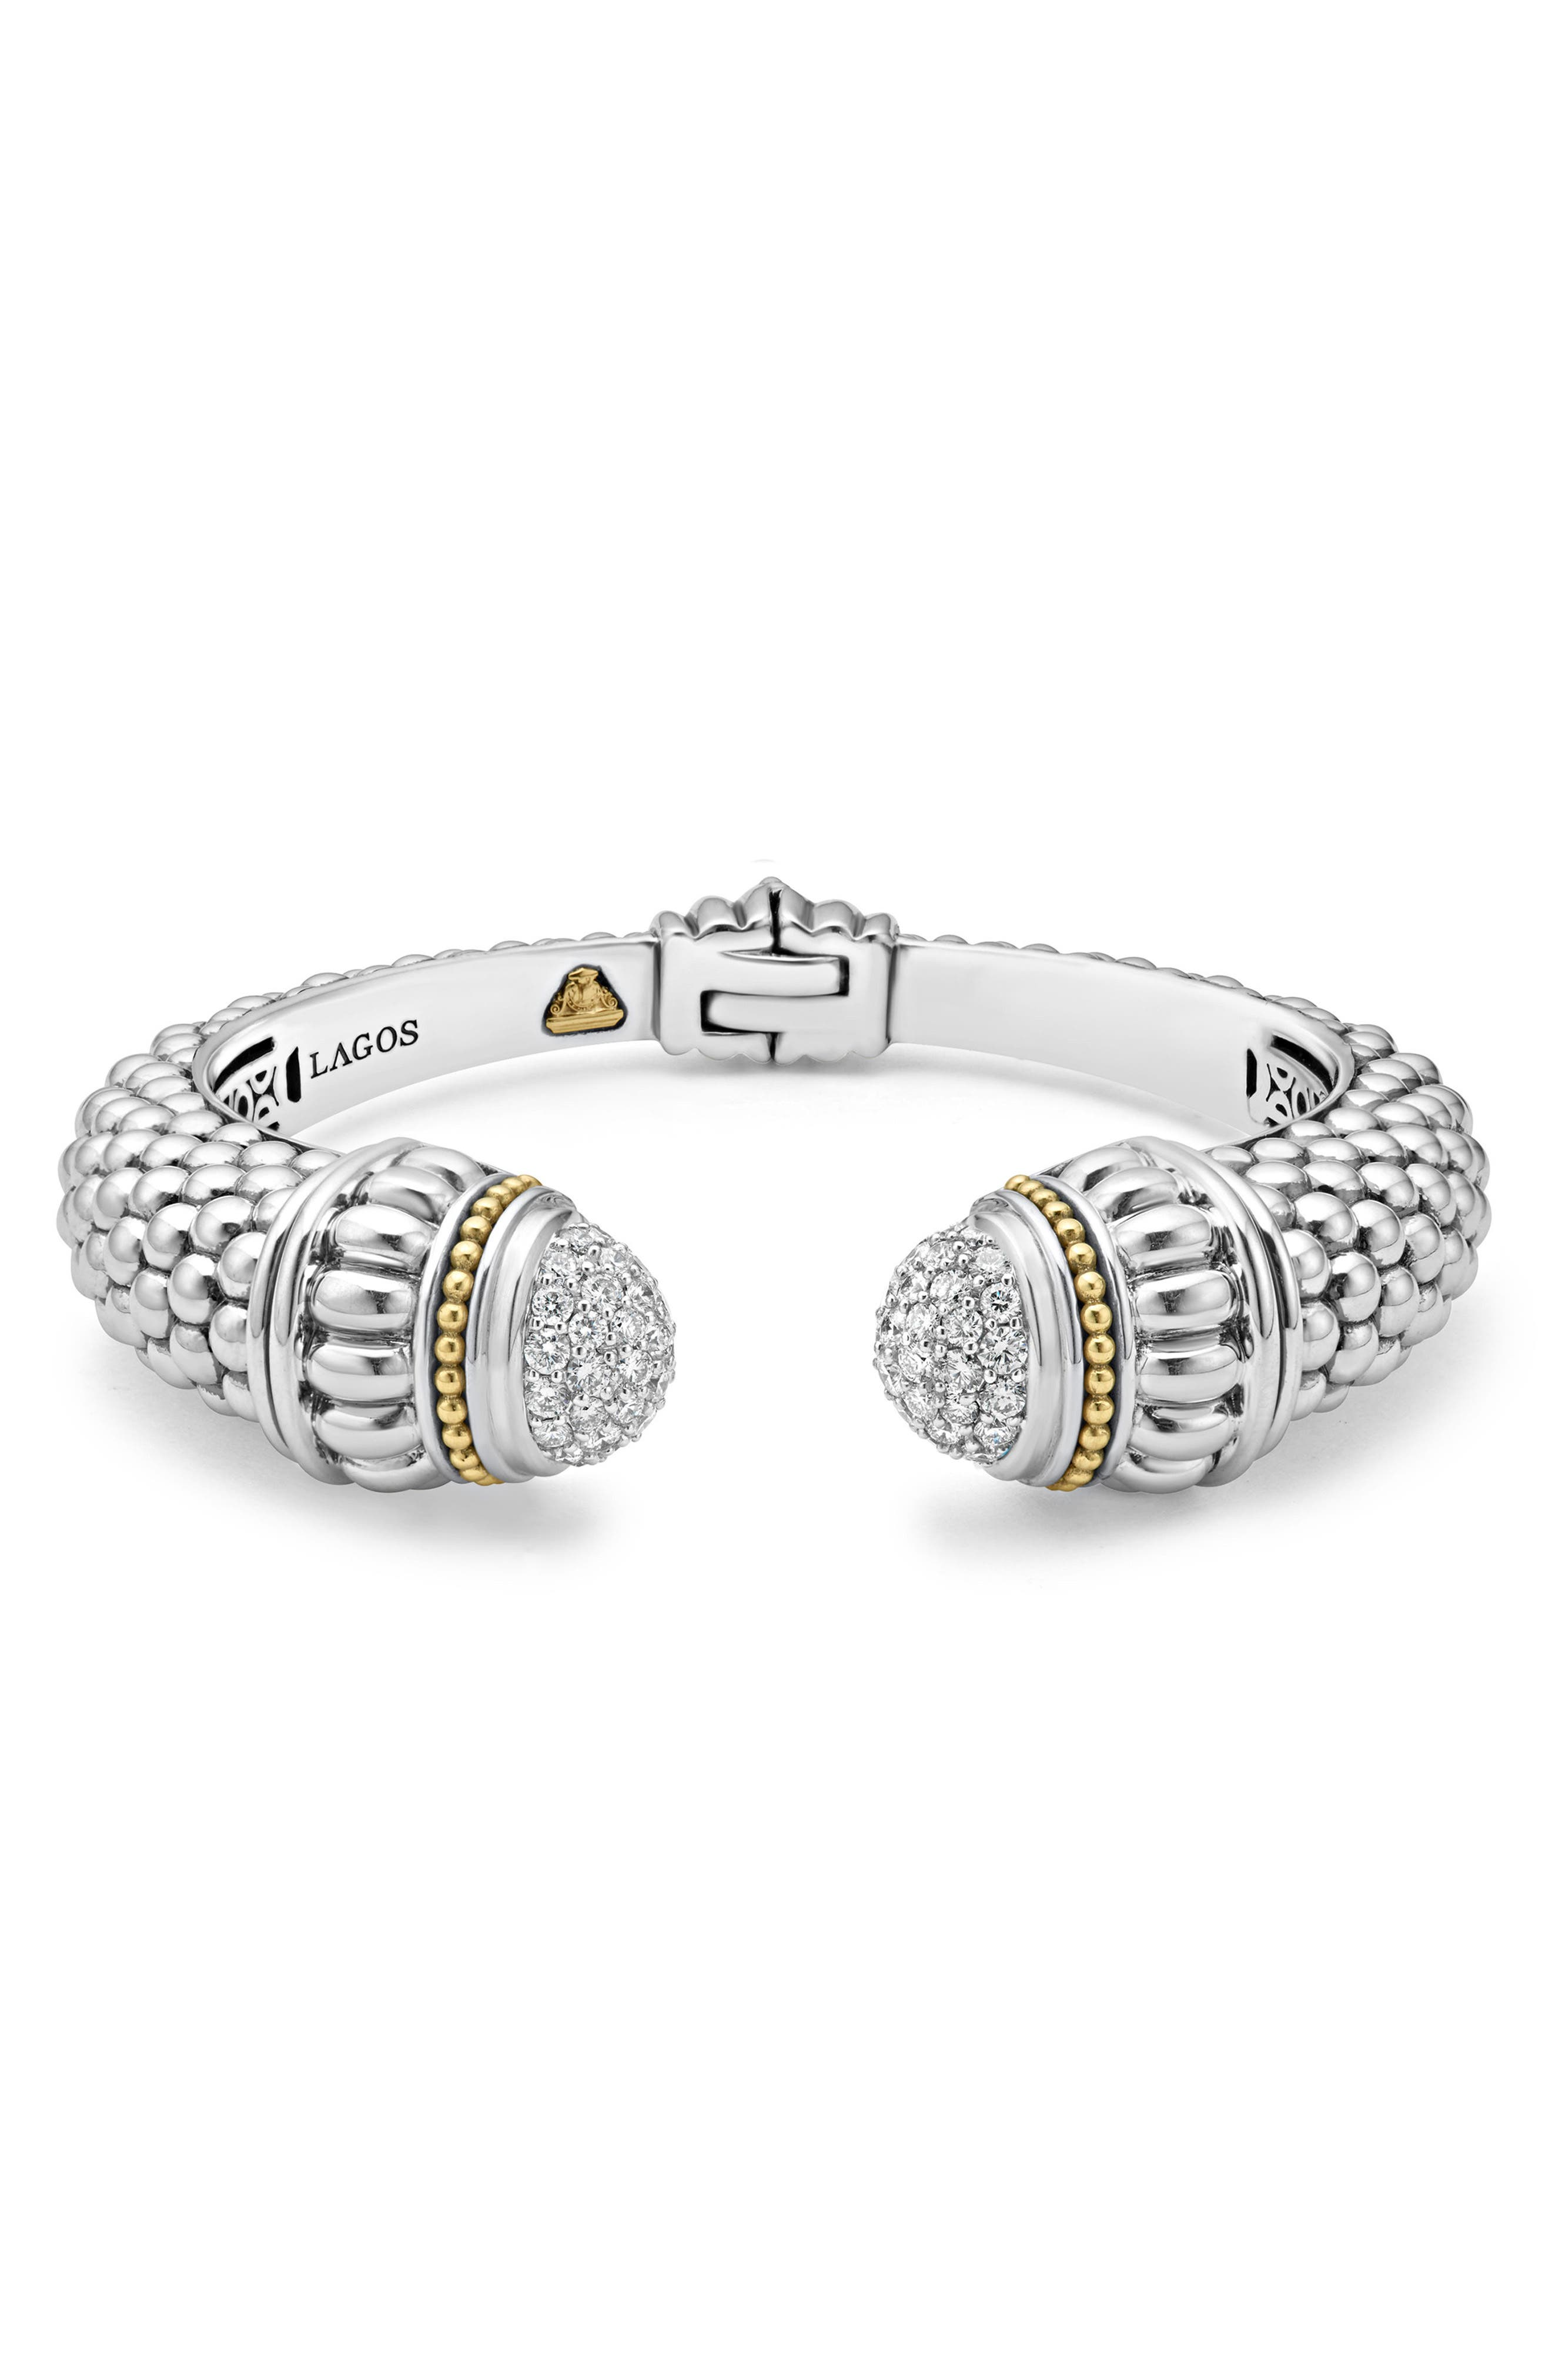 LAGOS Caviar Diamond Hinge Cuff